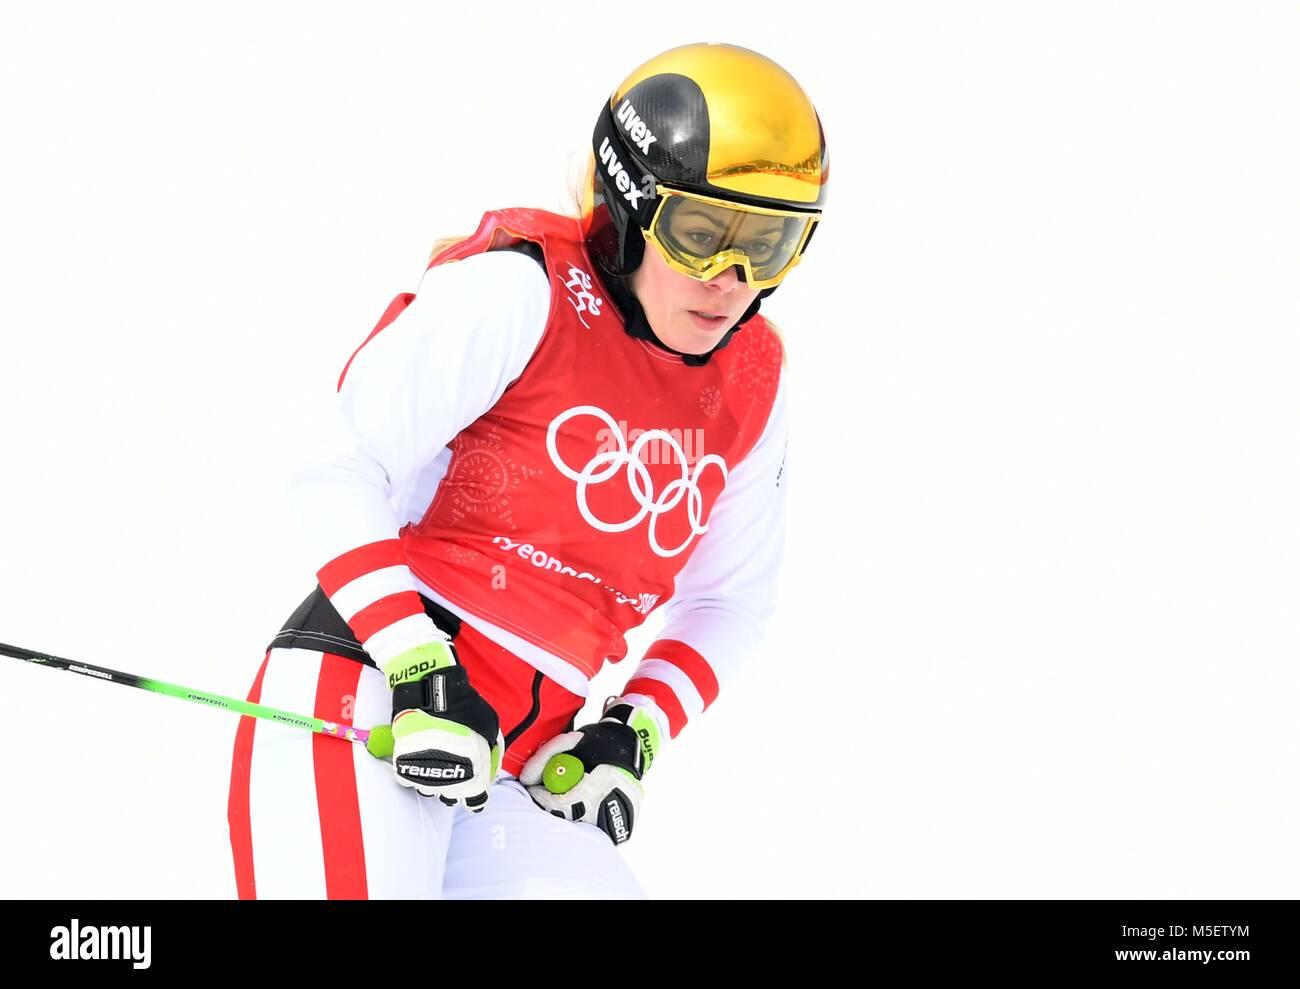 Winter Olympics 2018 Pyeongchang, South Korea . 23rd February, 2018. Andrea Limbacher (AUT). 1/8 final. Womens ski - Stock Image